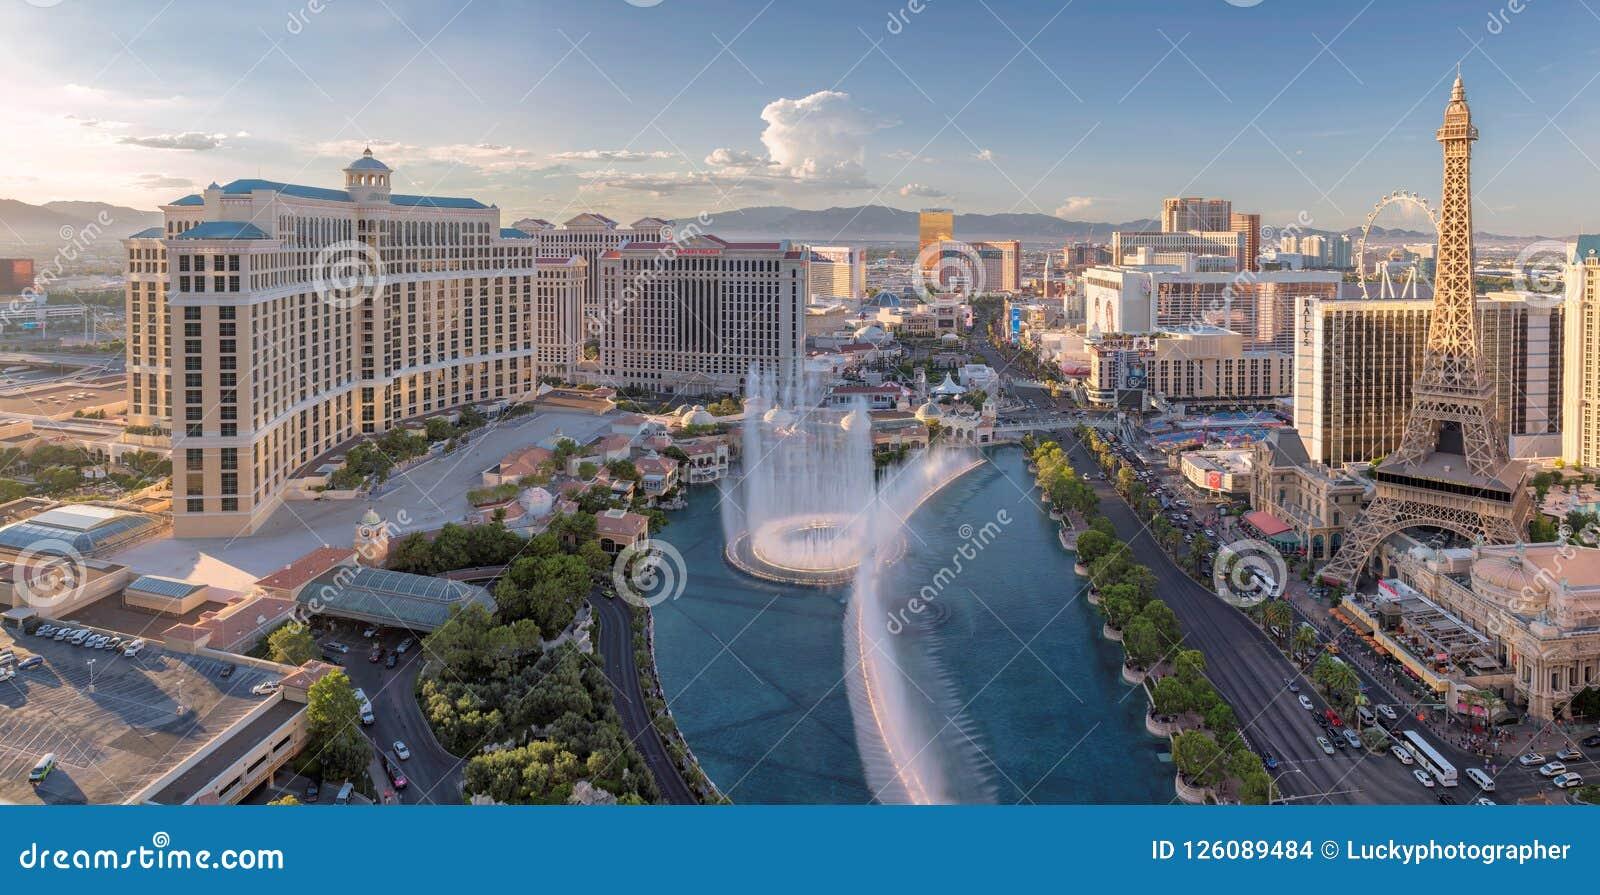 panoramic view of las vegas strip at sunset editorial stock image image of bellagio casinos. Black Bedroom Furniture Sets. Home Design Ideas